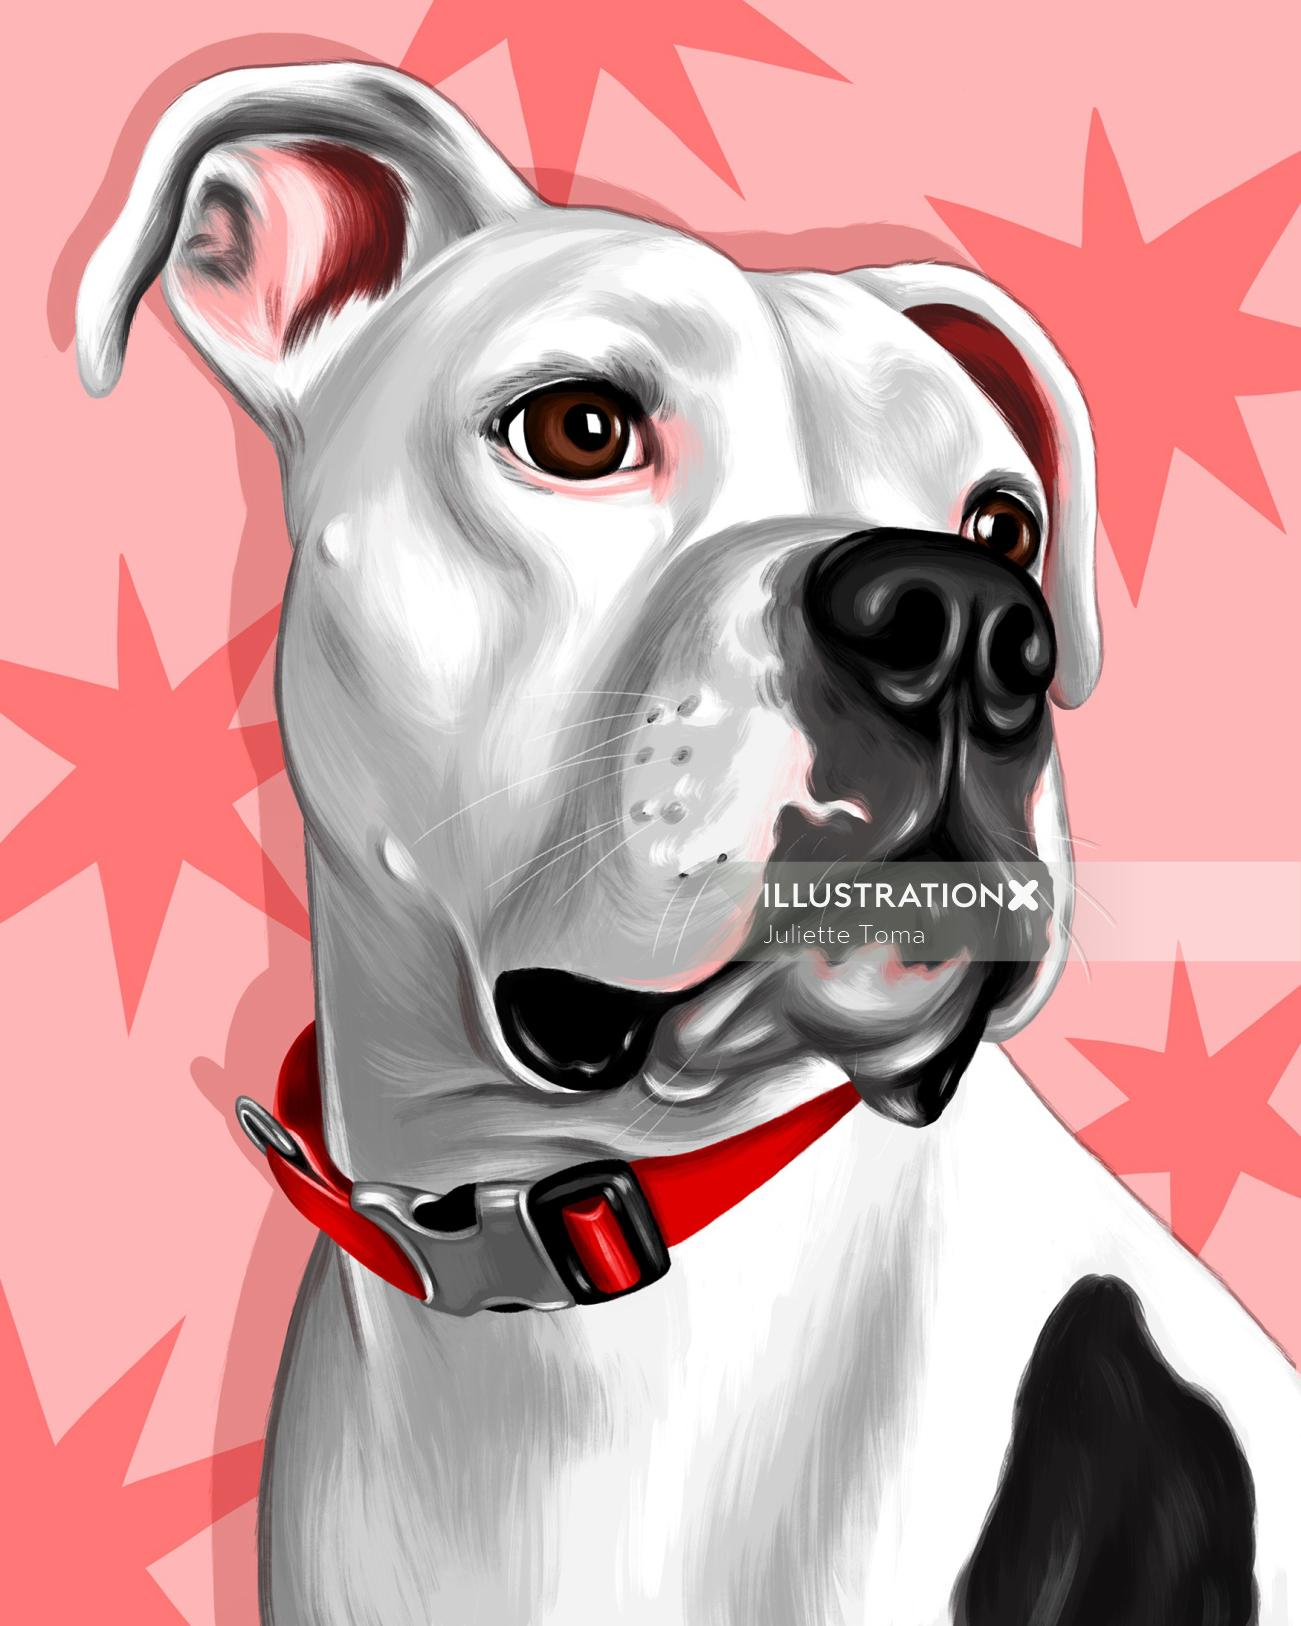 Portrait art of dog